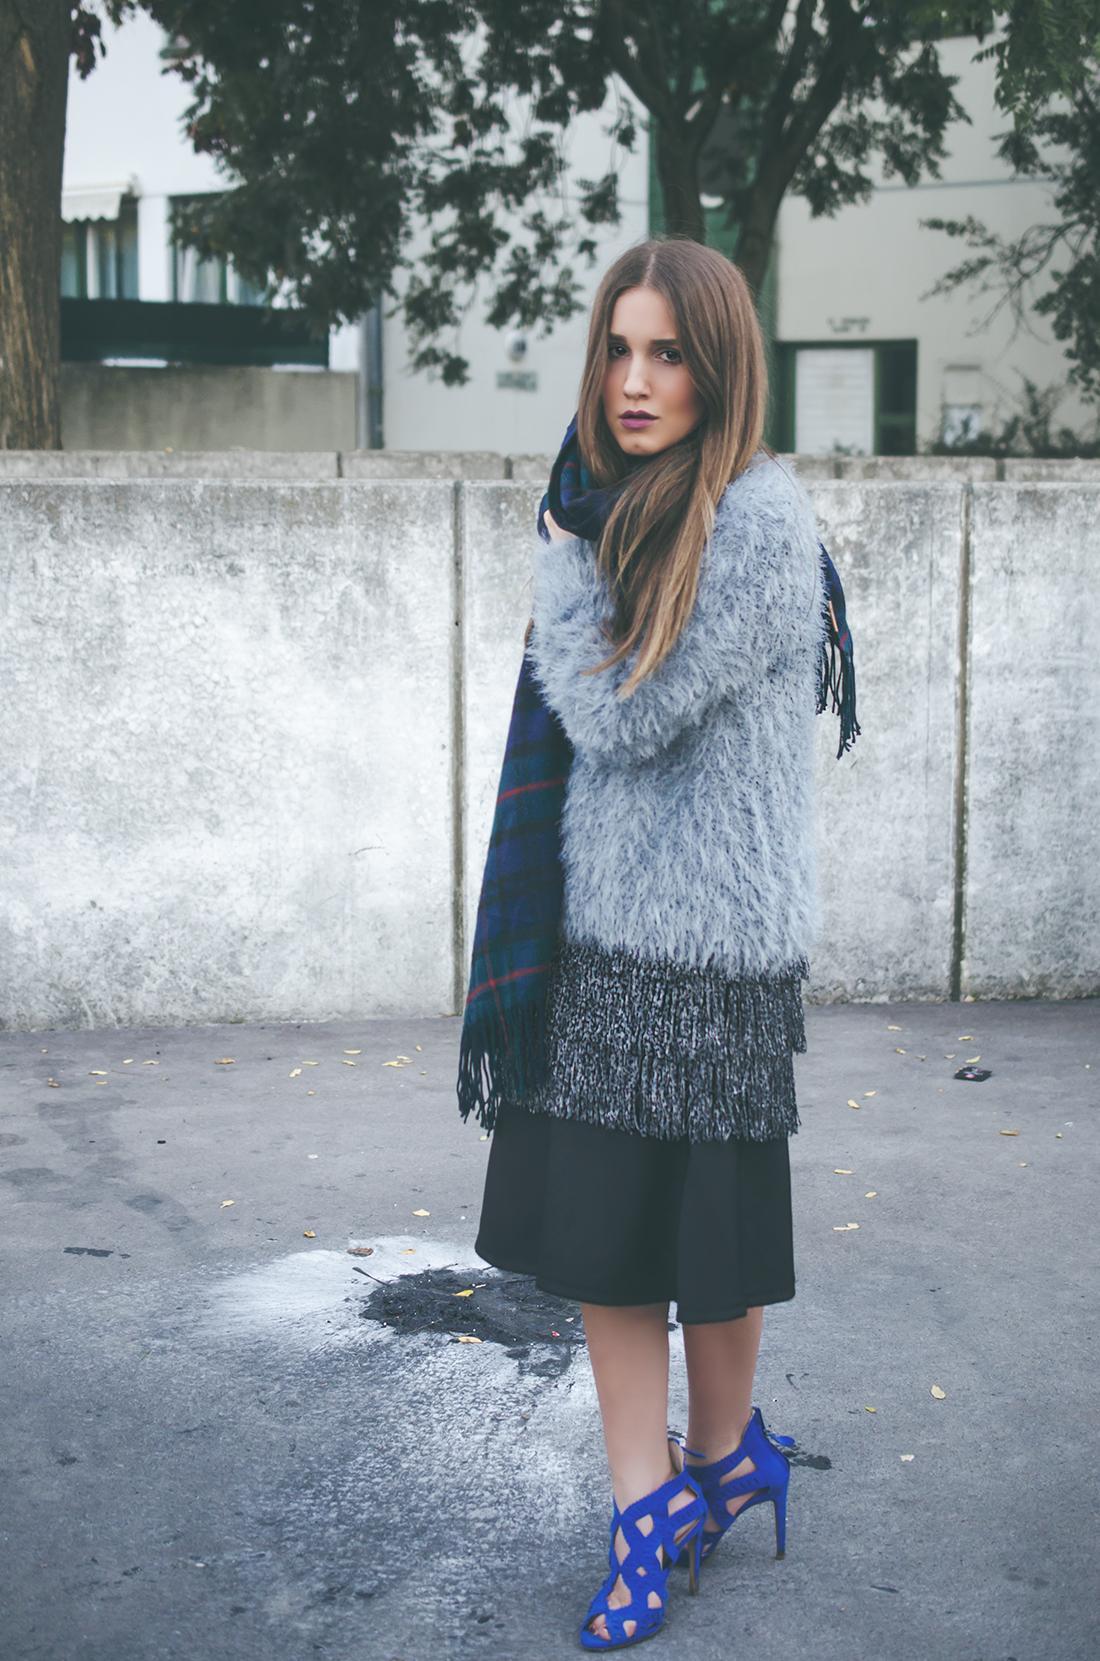 oversized outfit kombination - fleur de mode - hristina micevska